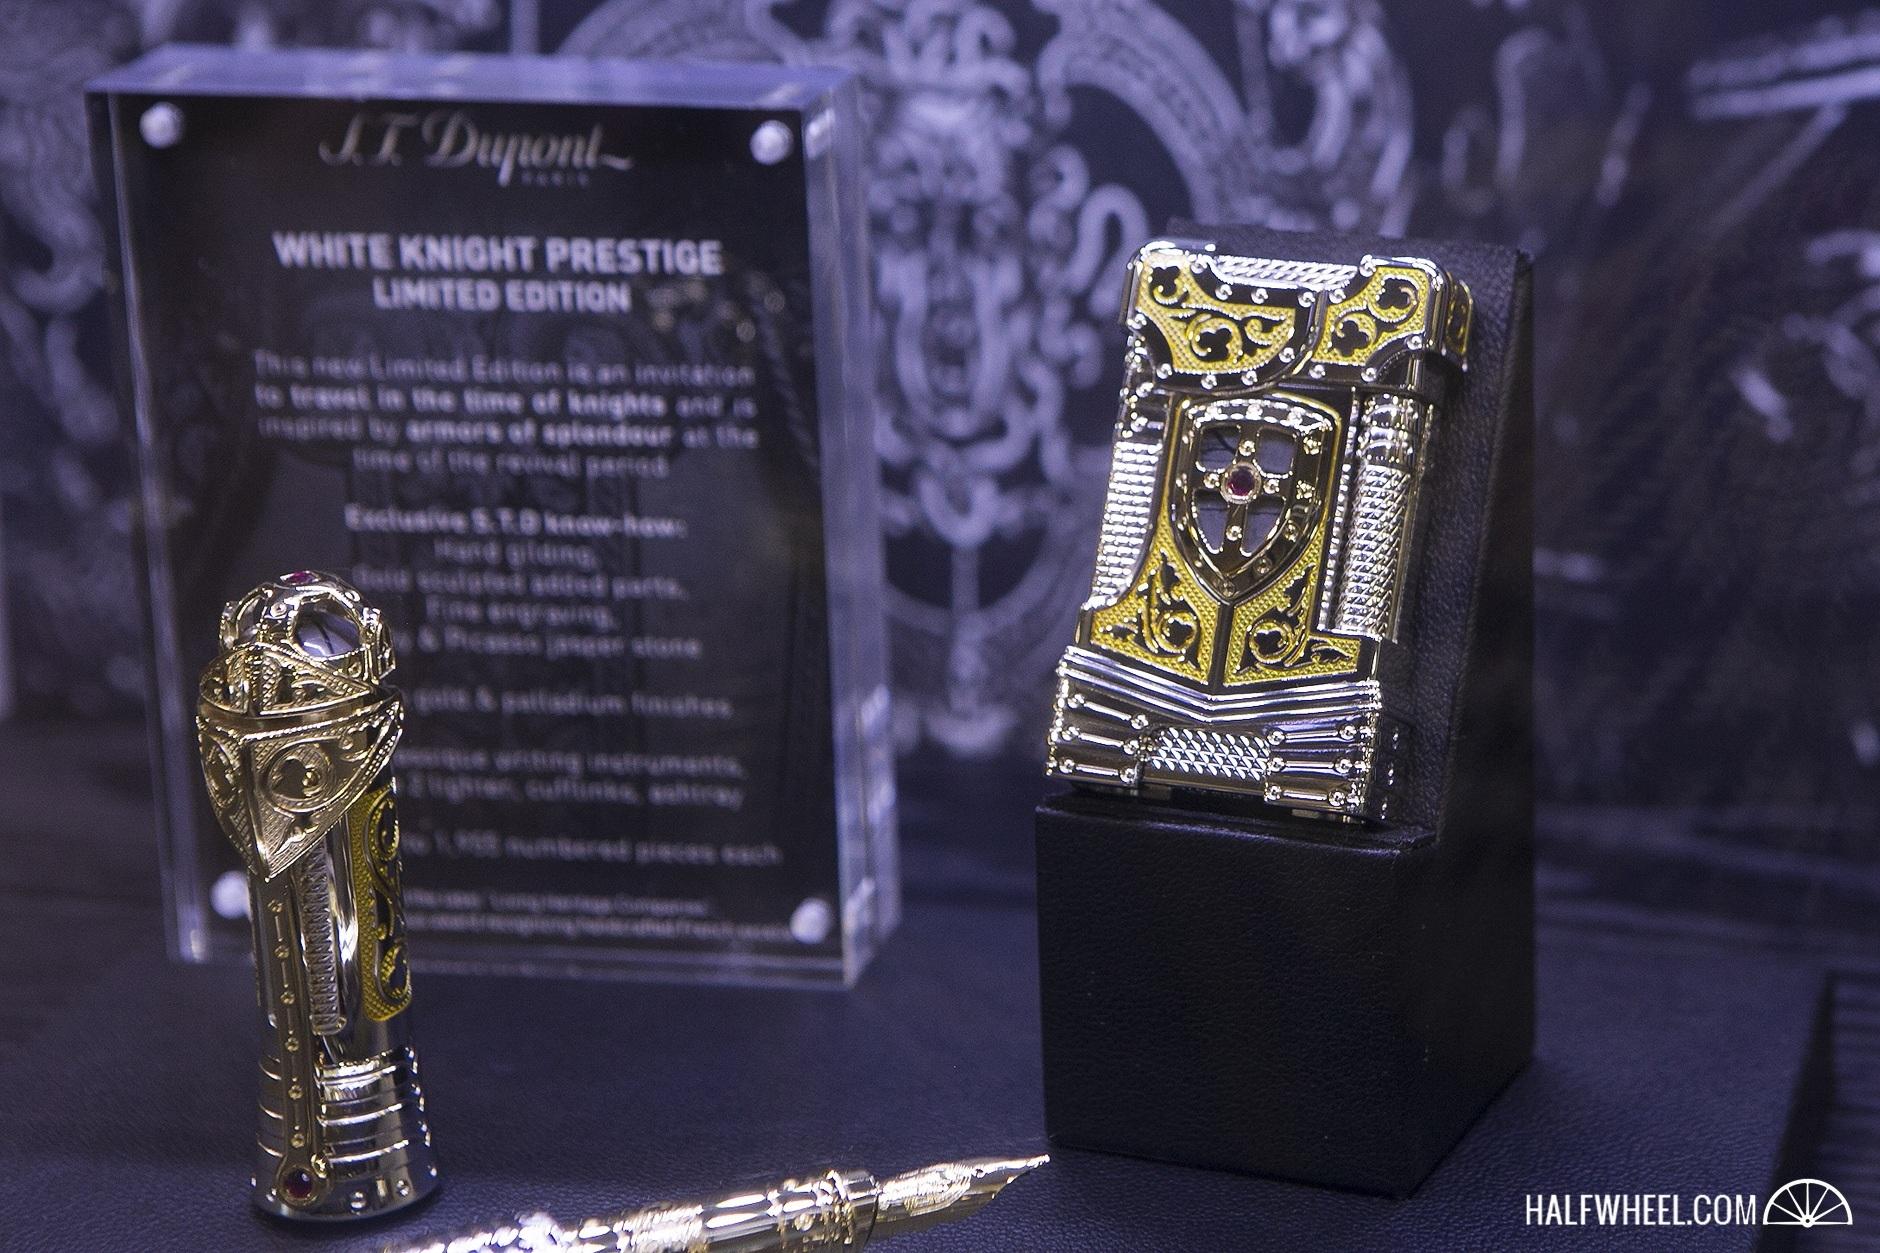 White Knight Prestige